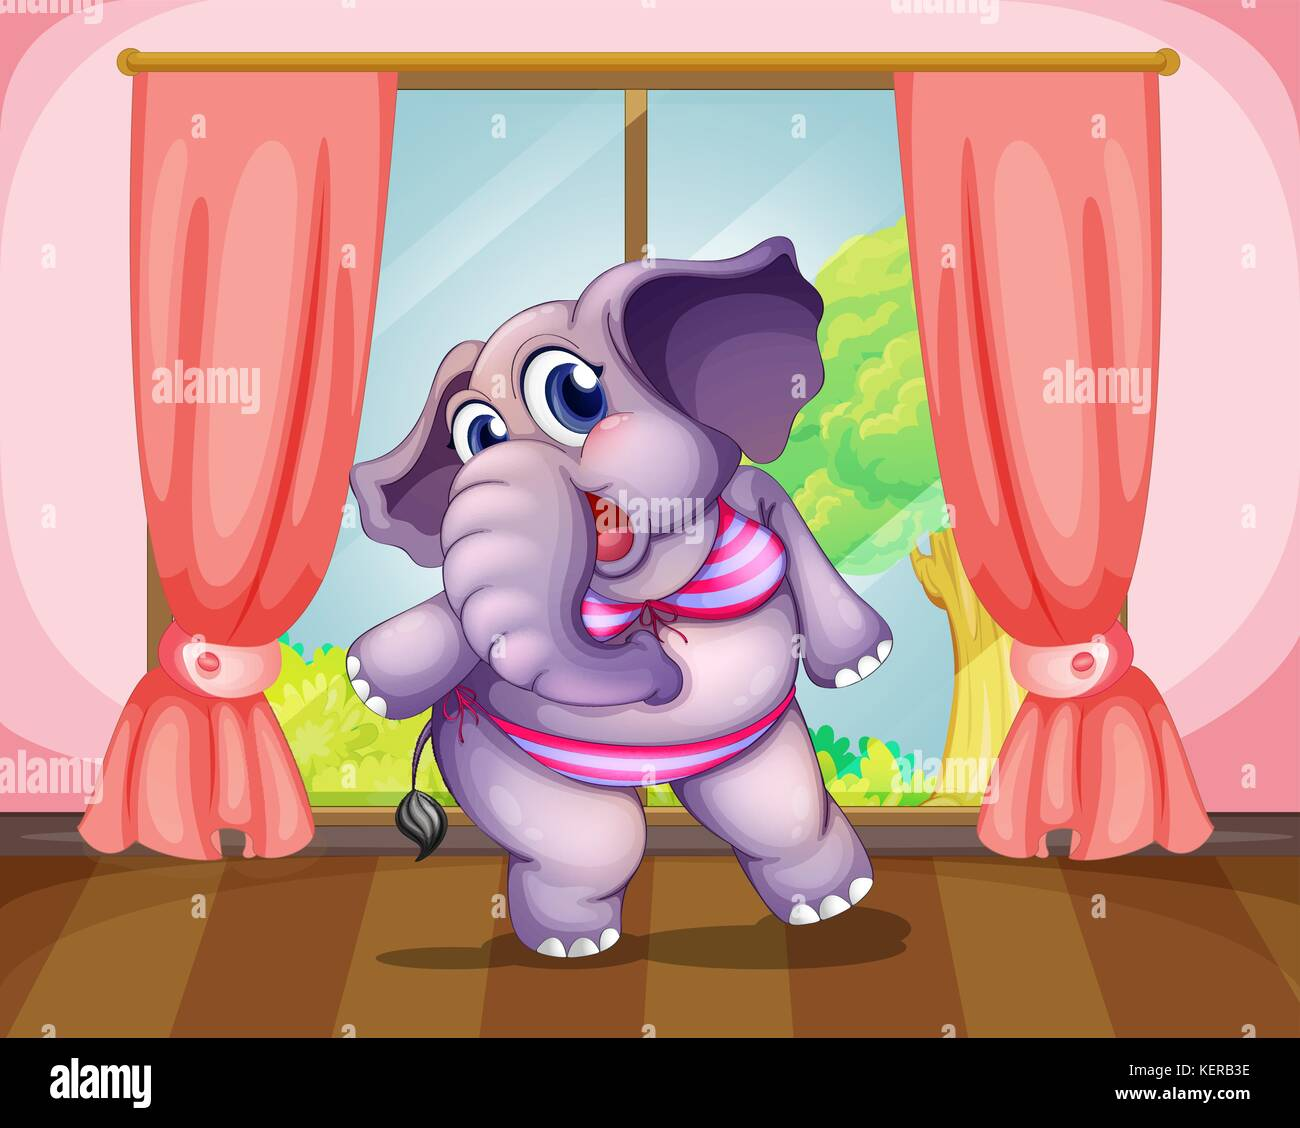 Illustration of an elephant wearing a swimwear - Stock Vector